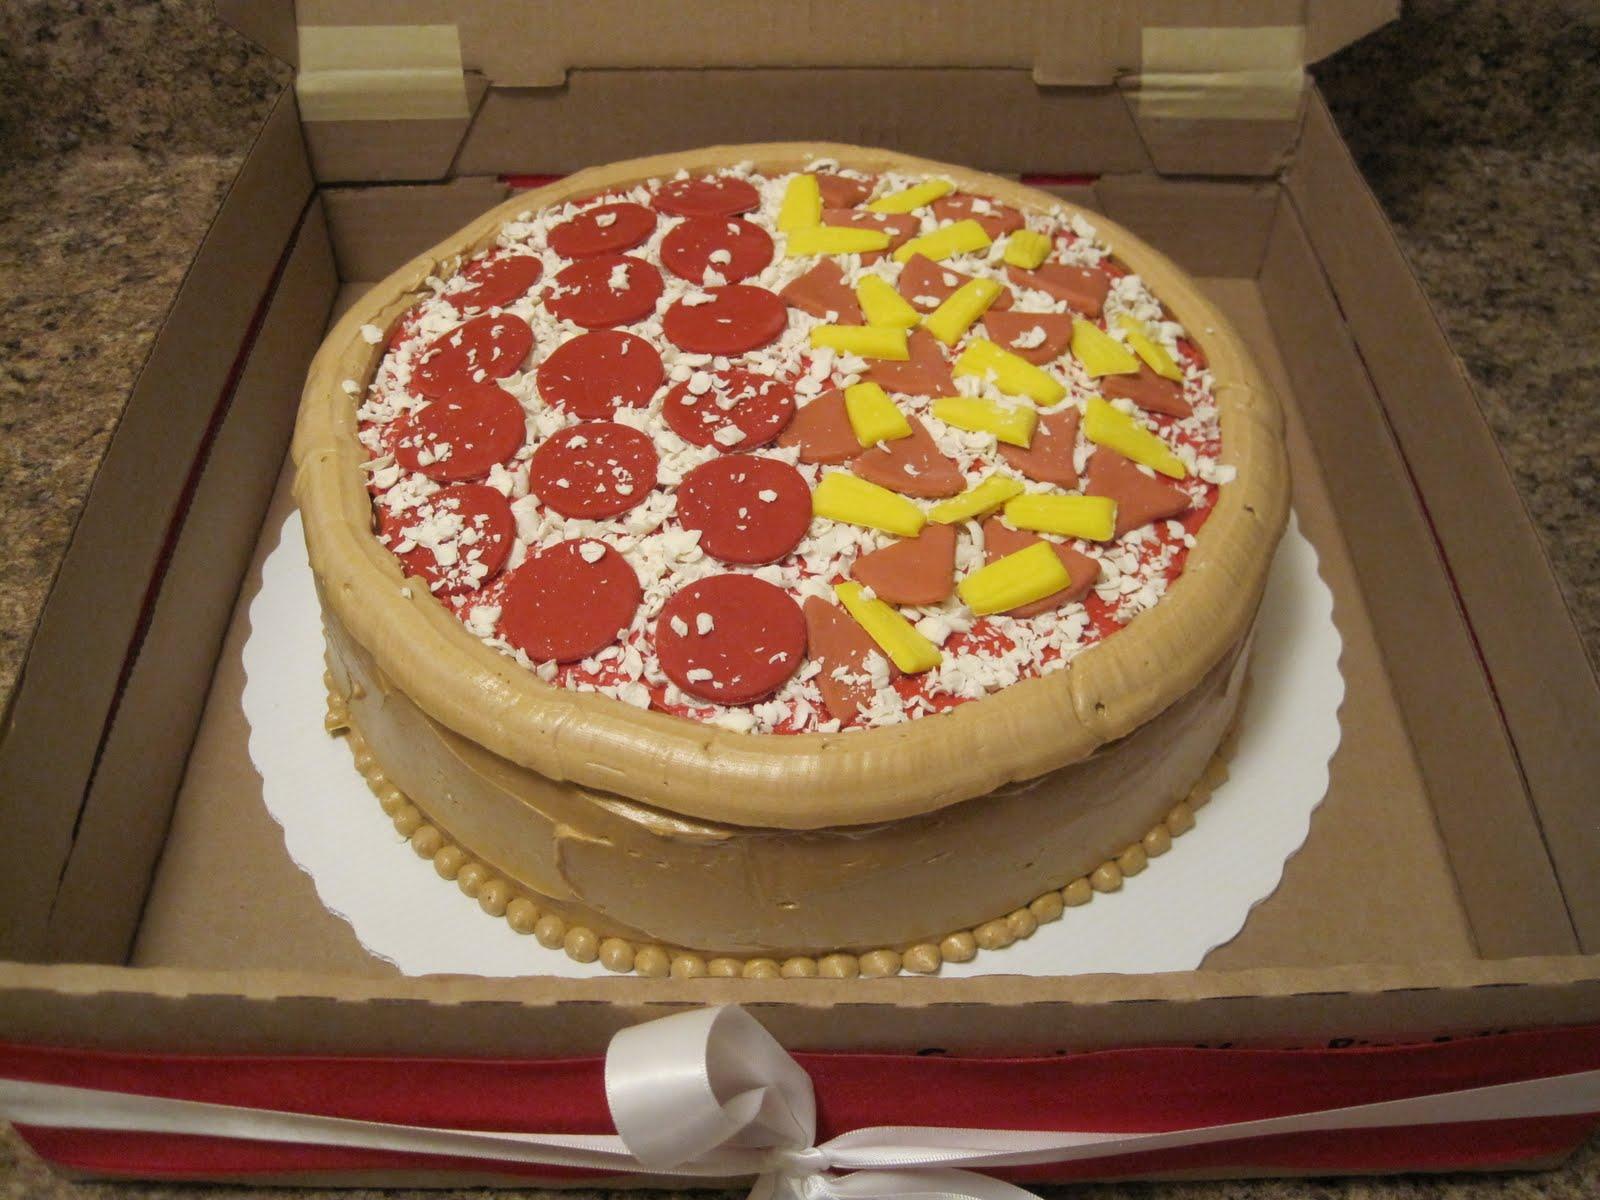 Gross Birthday Cakes